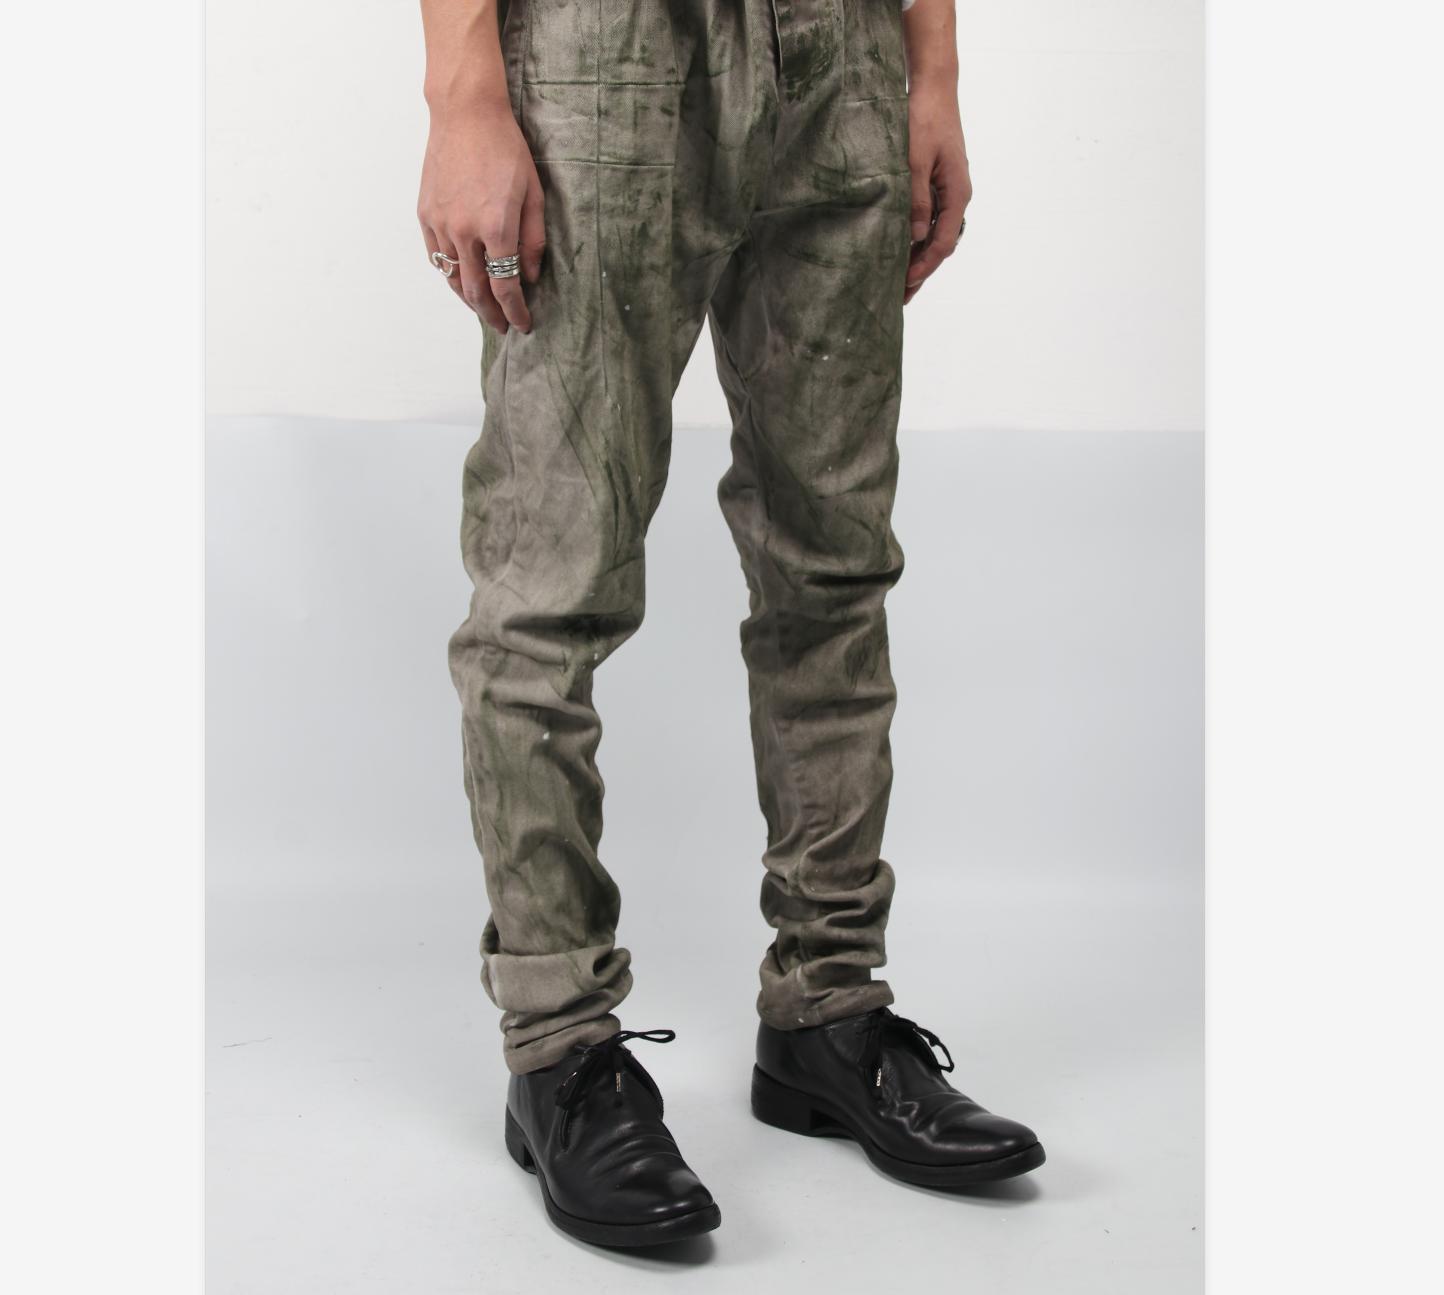 -TTULF- 重工OBJECT DYED定向染色P13型BBS风格纯棉修身款长裤